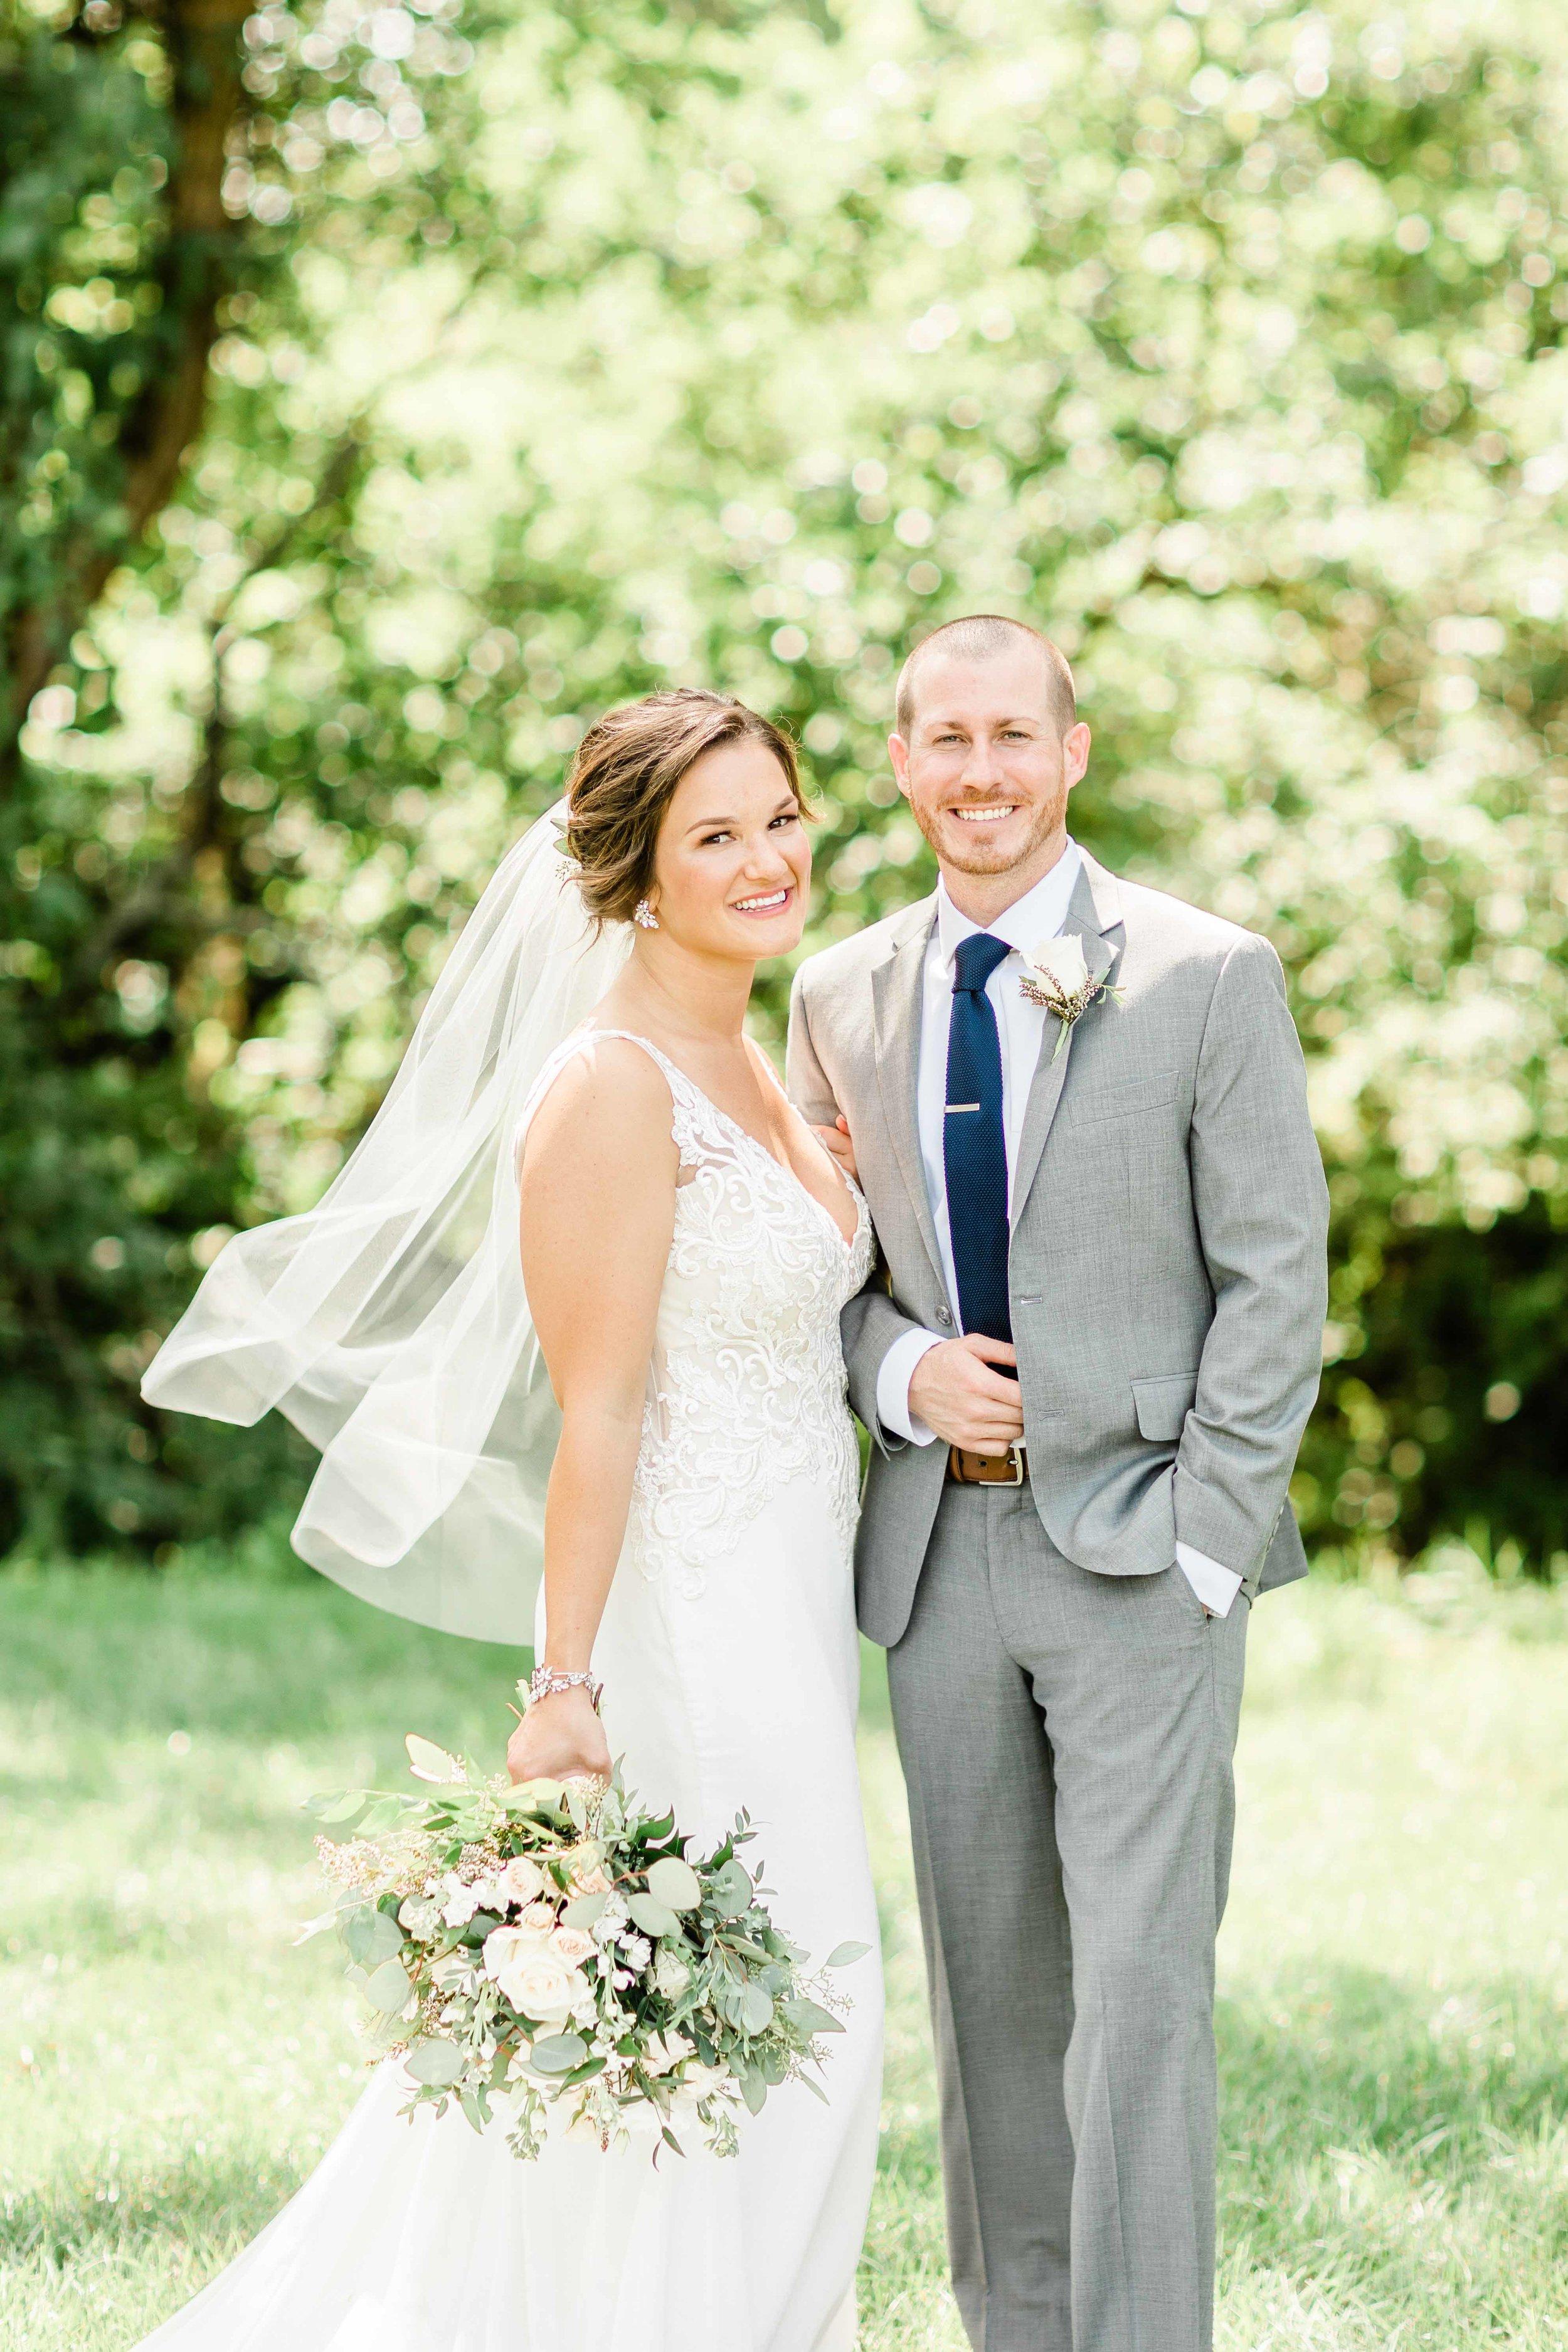 light and airy wedding photographers cincinnati ohio-3.jpg